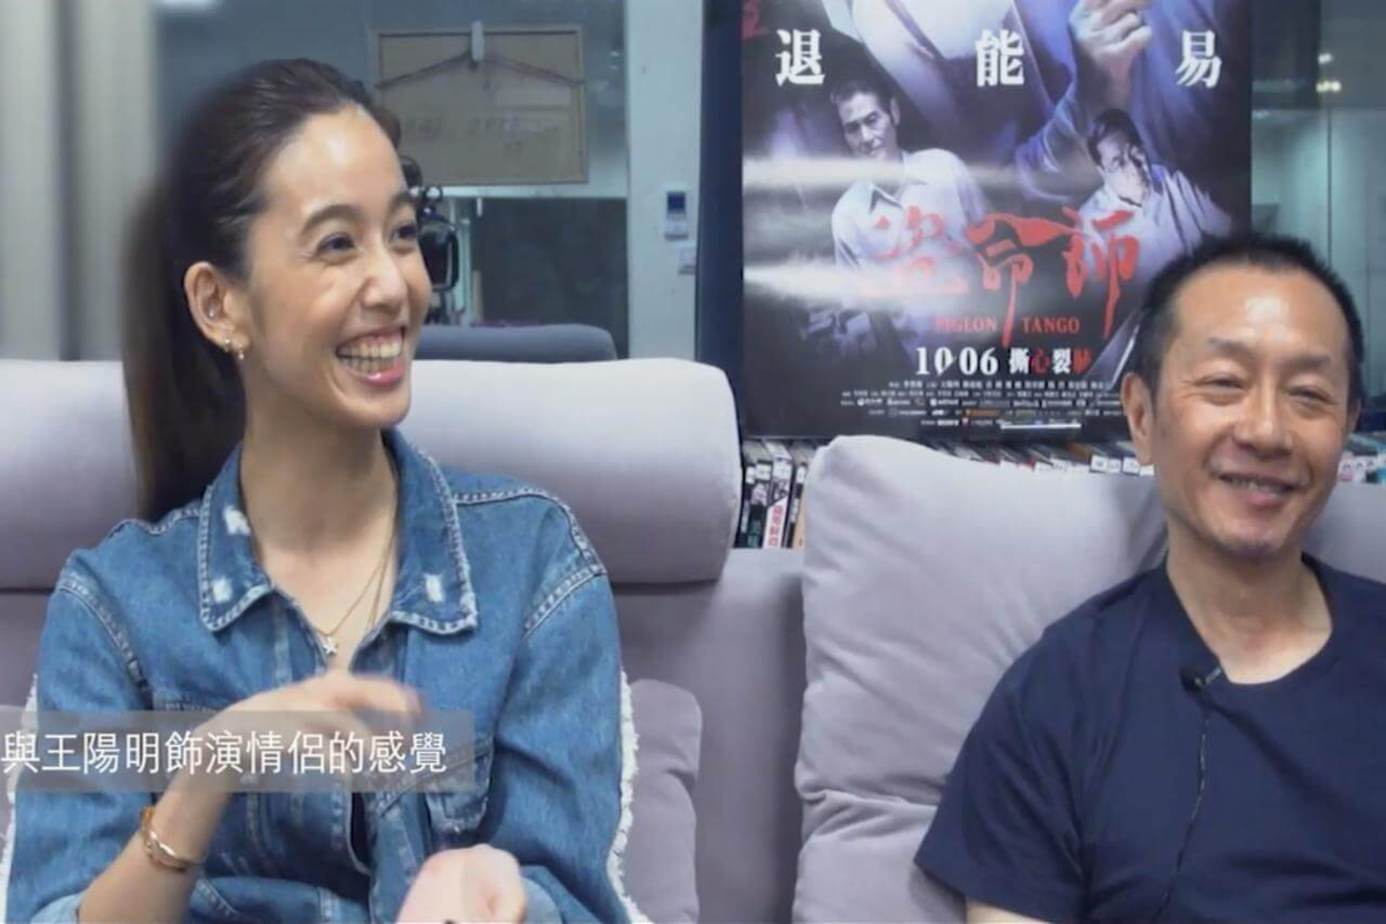 【friDay影音最大咖】《盜命師》李啓源導演、陳庭妮專訪